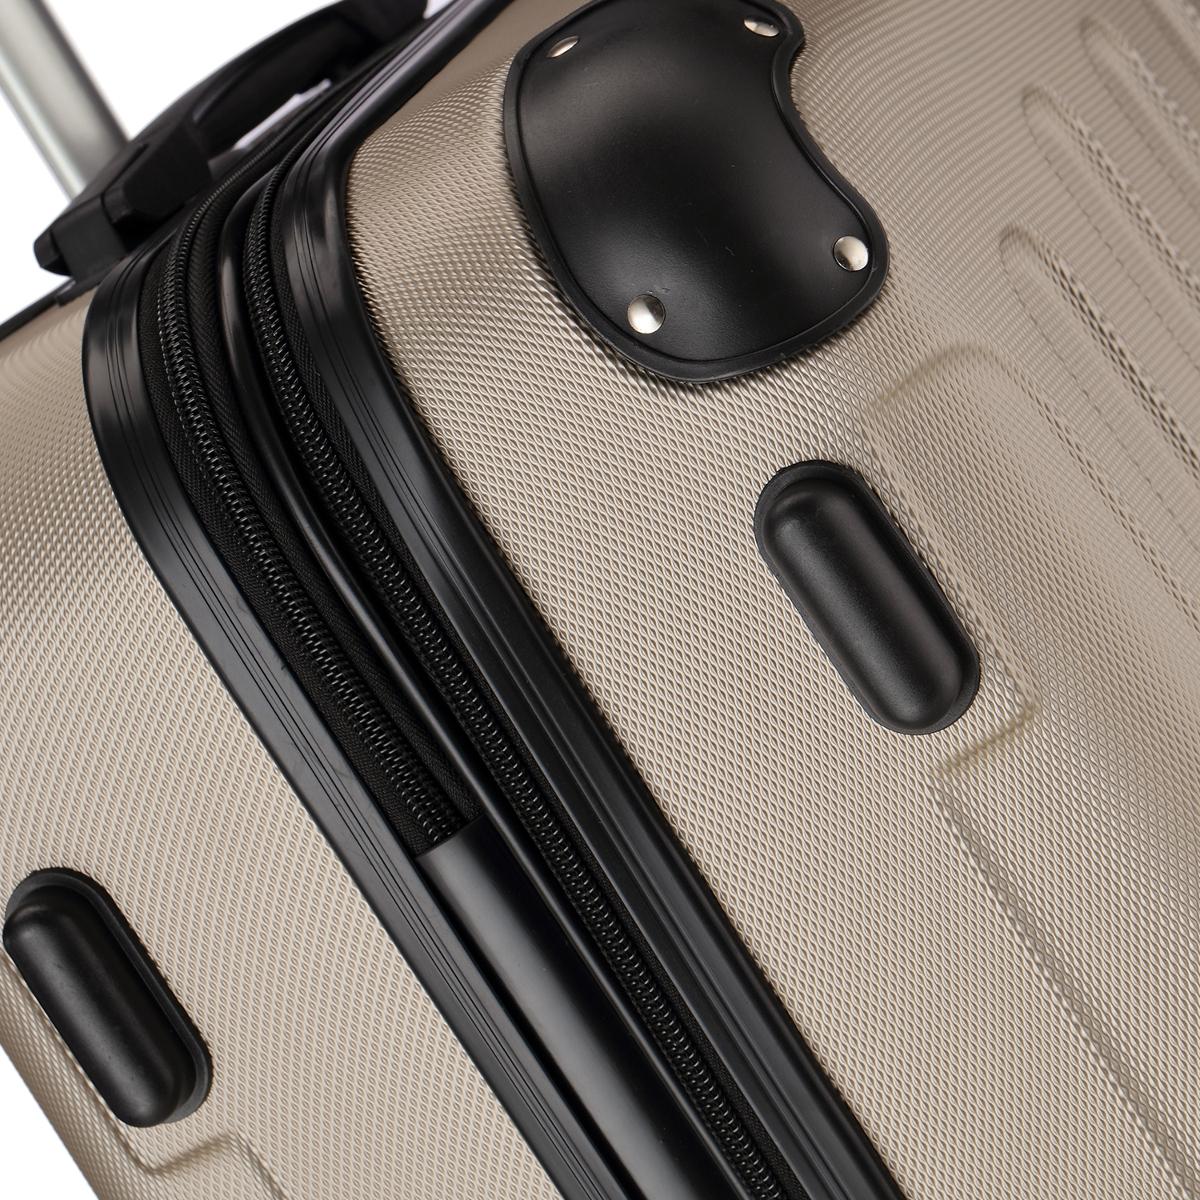 Koffer-Flexot-2045-Hartschalenkoffer-Trolley-Kofferset-Reisekoffer-M-L-XL-Set Indexbild 52